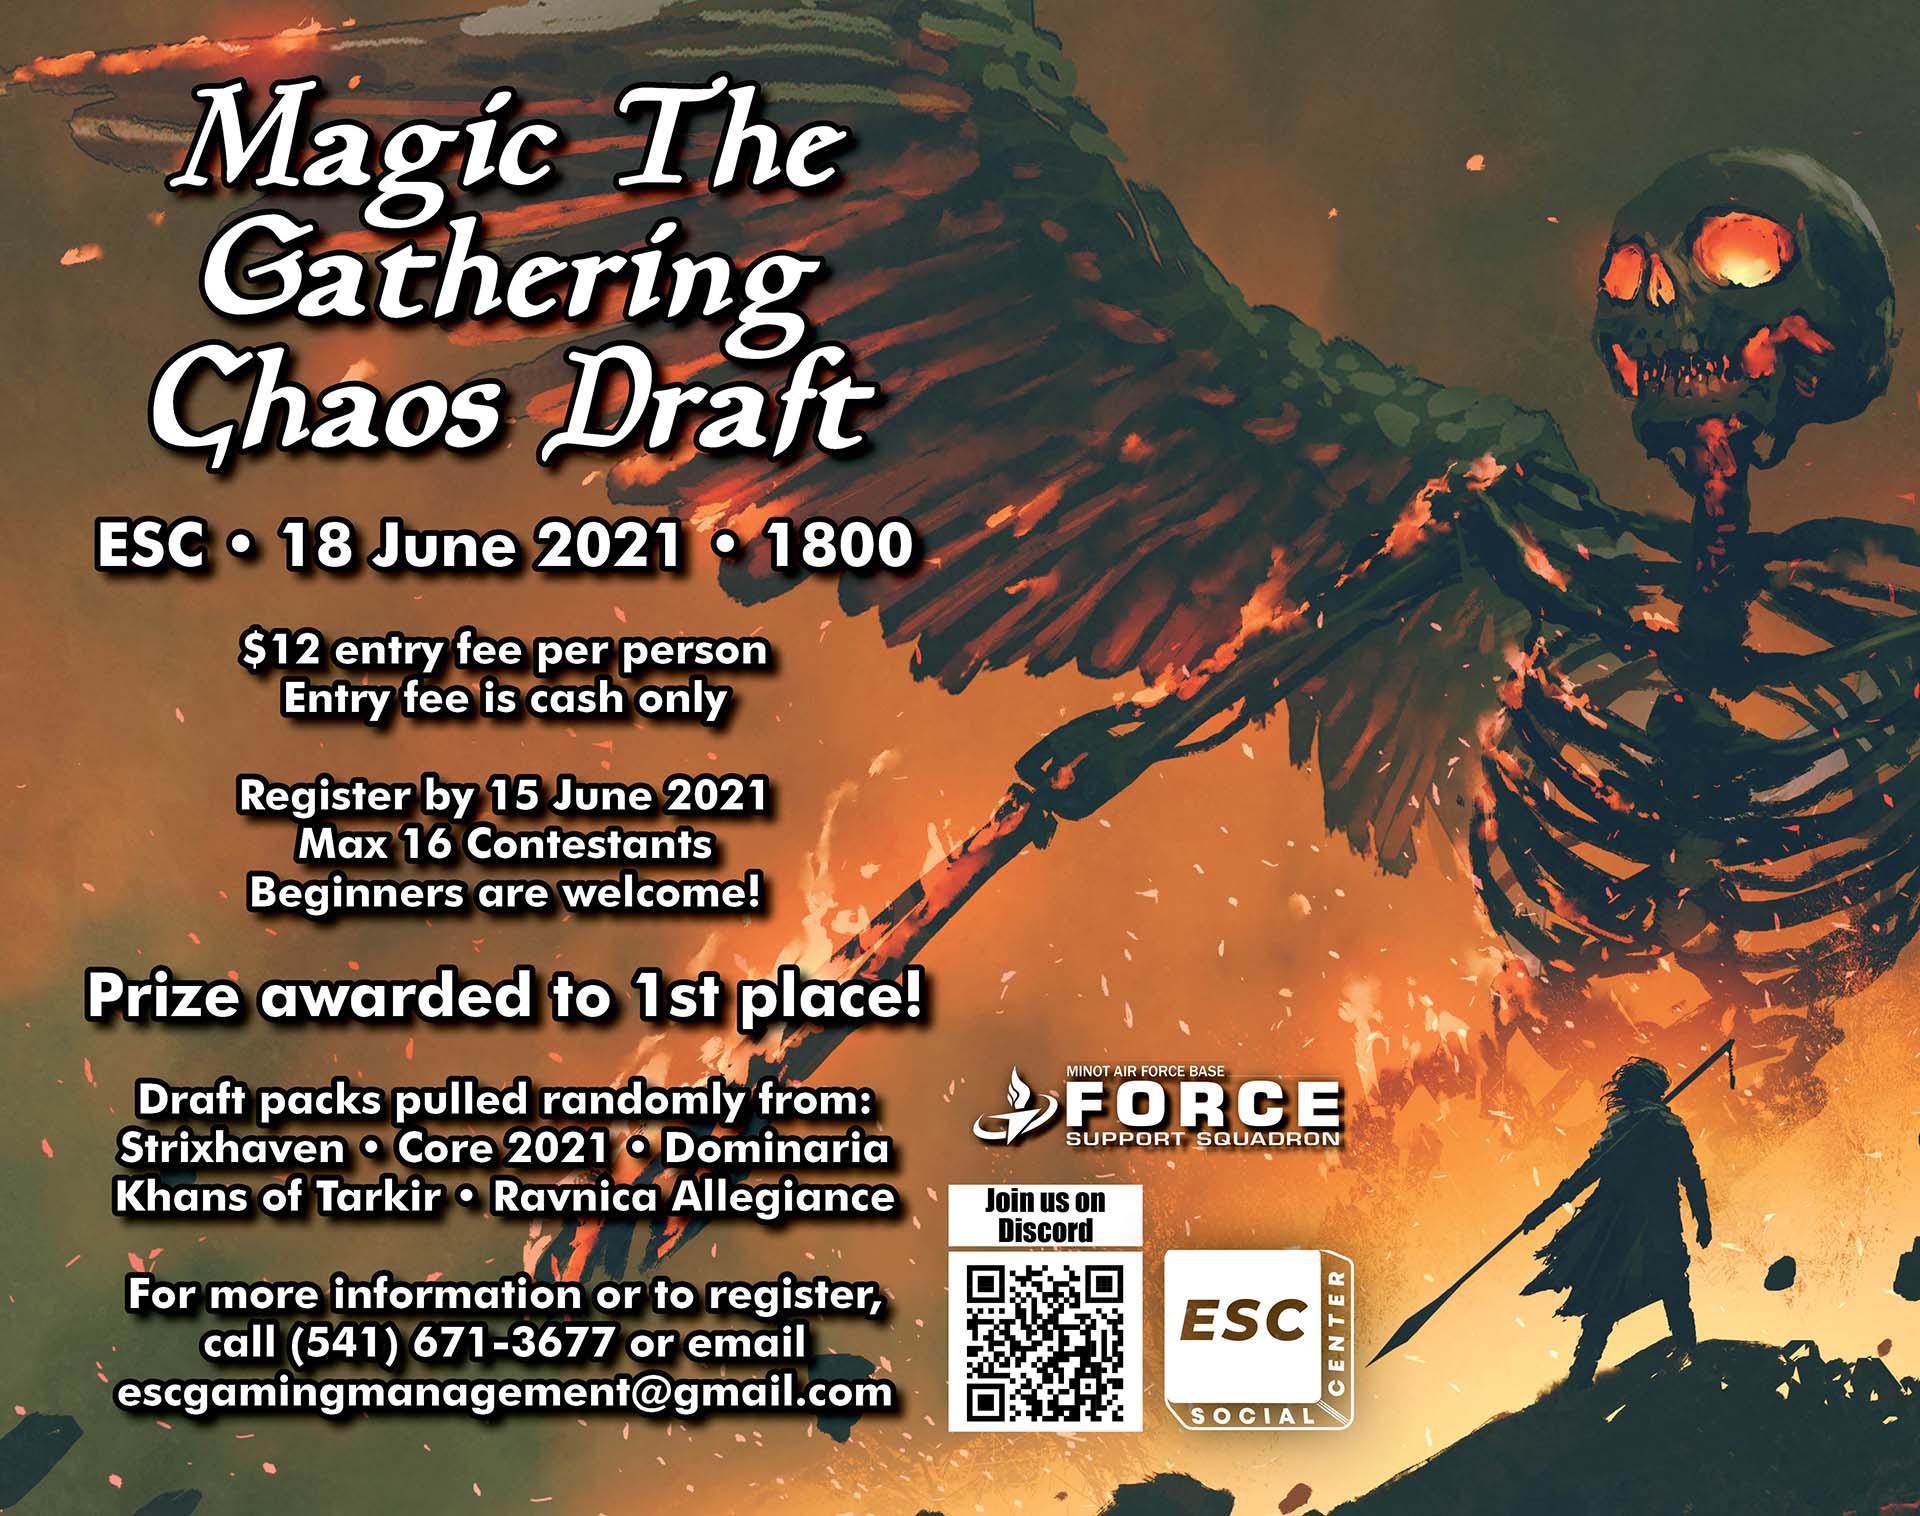 Magic The Gathering Chaos Draft